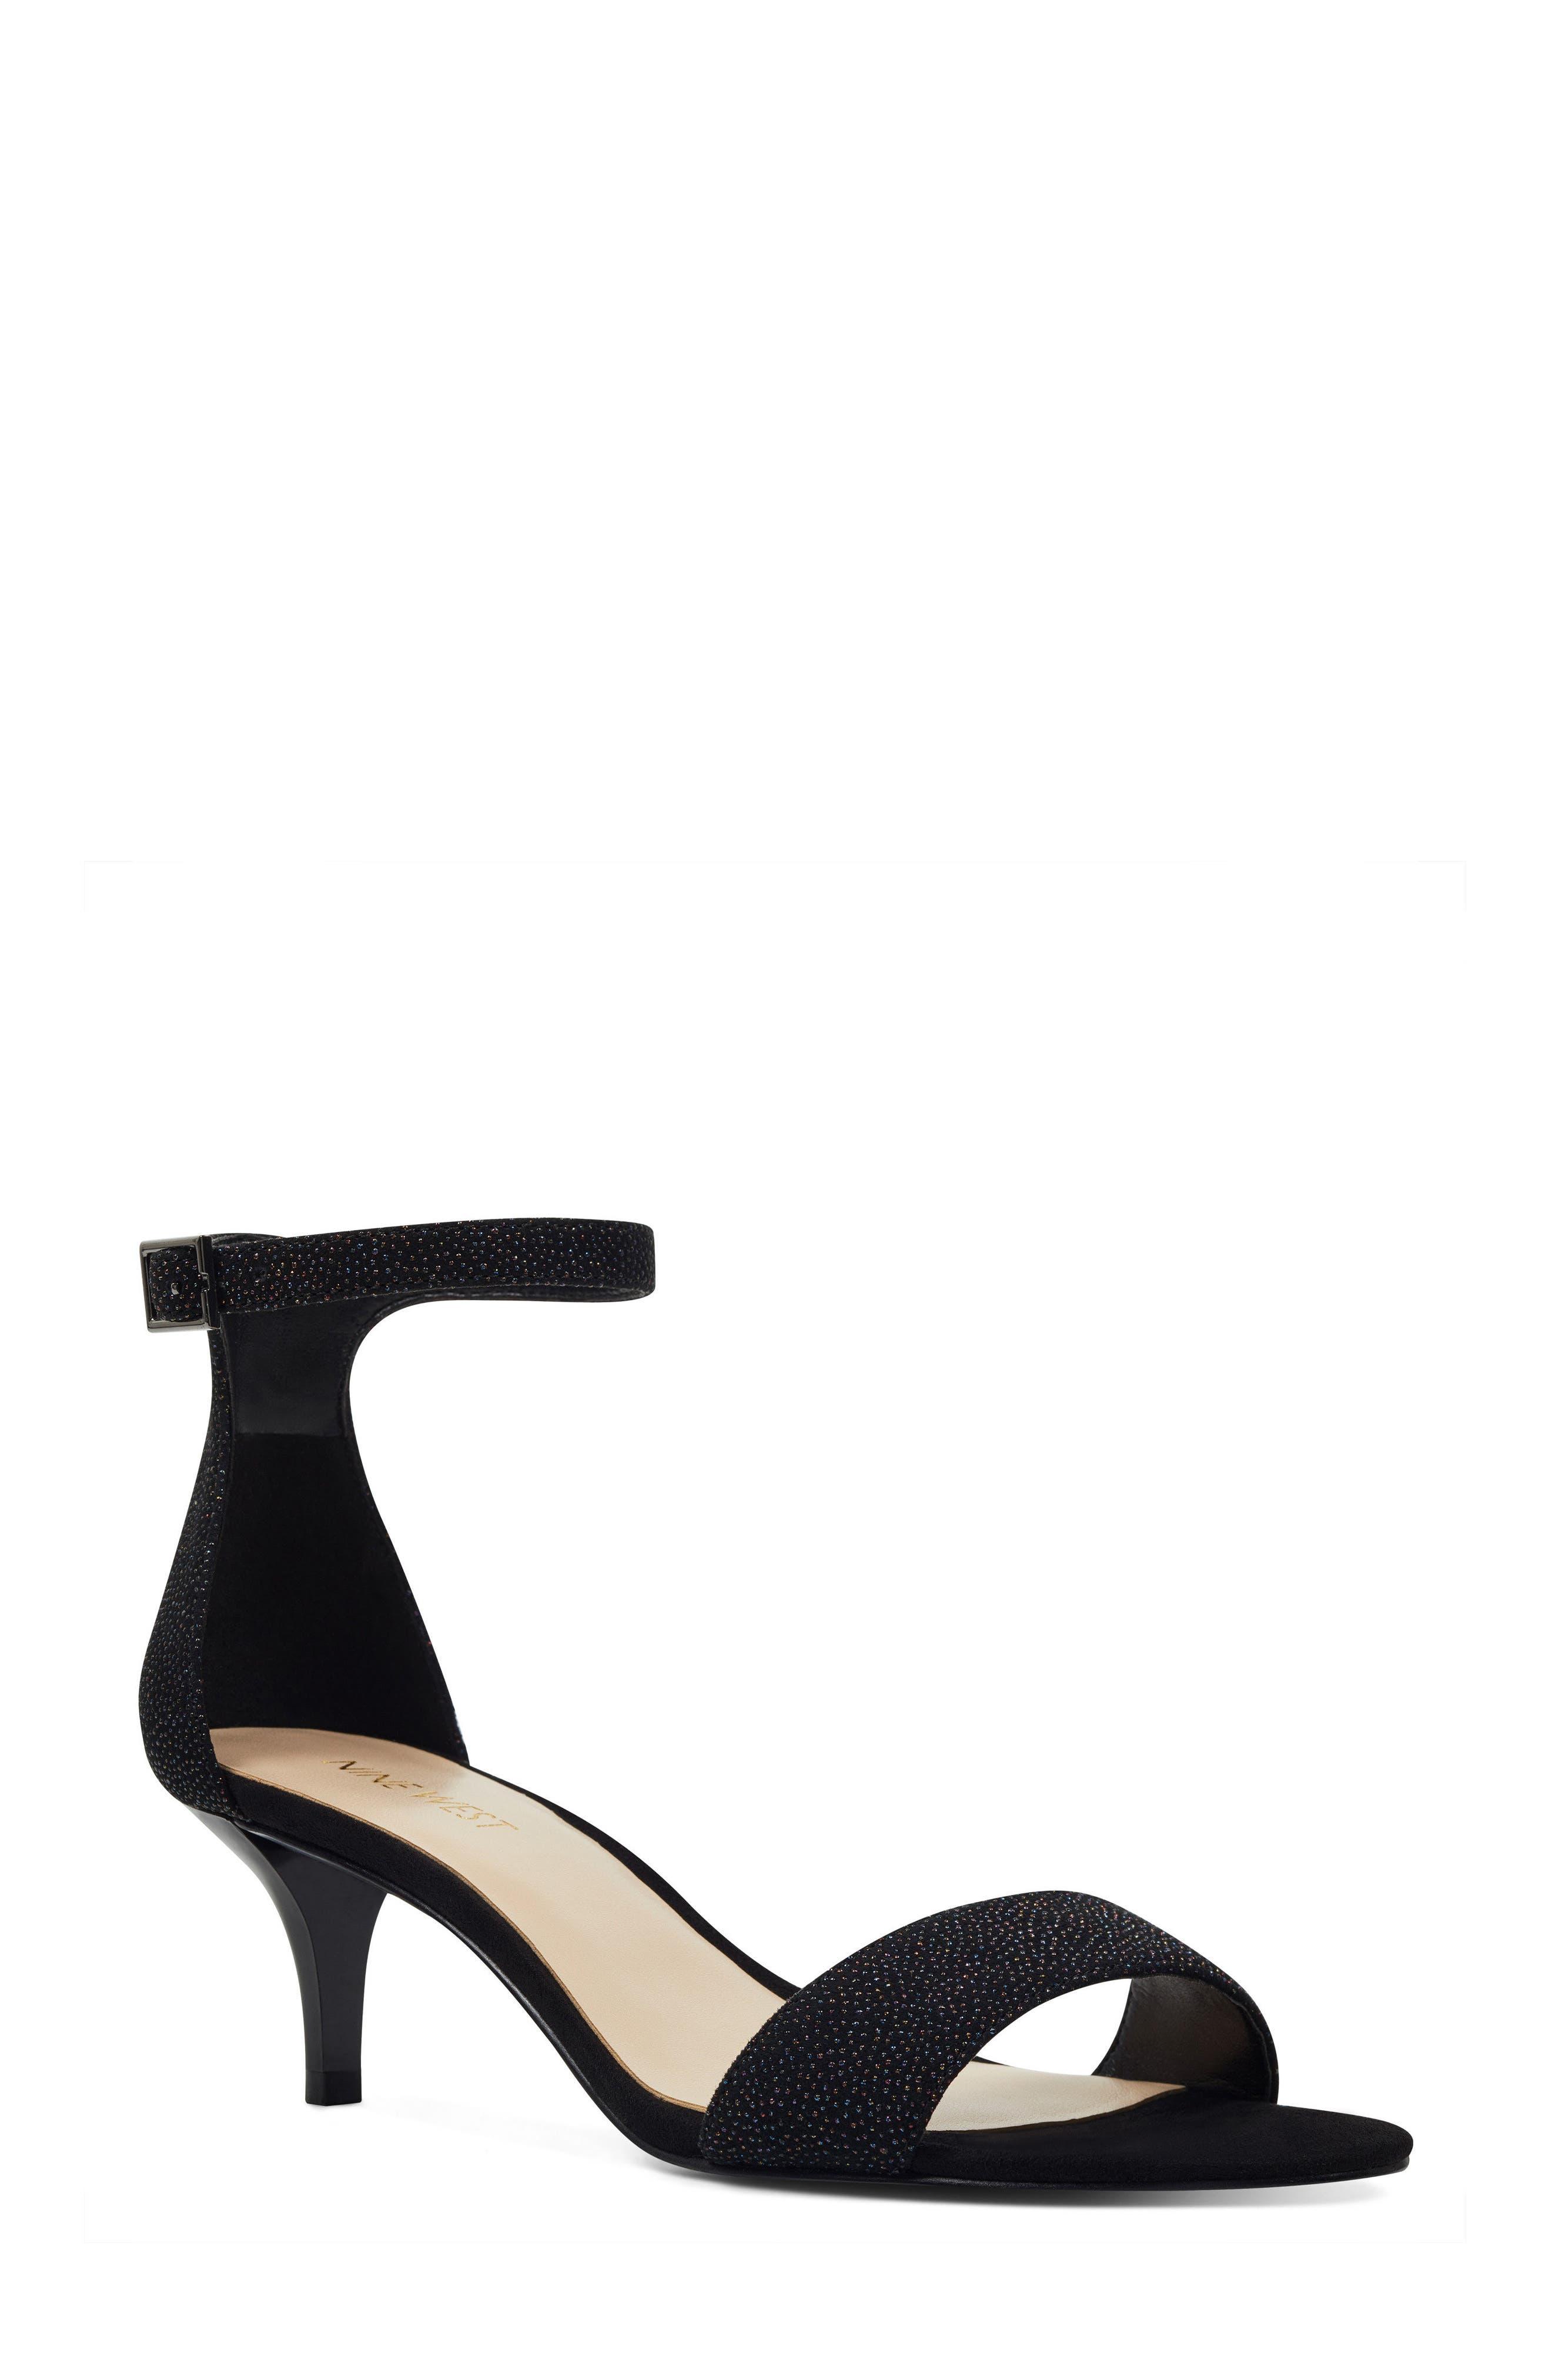 'Leisa' Ankle Strap Sandal,                         Main,                         color, BLACK MULTI LEATHER